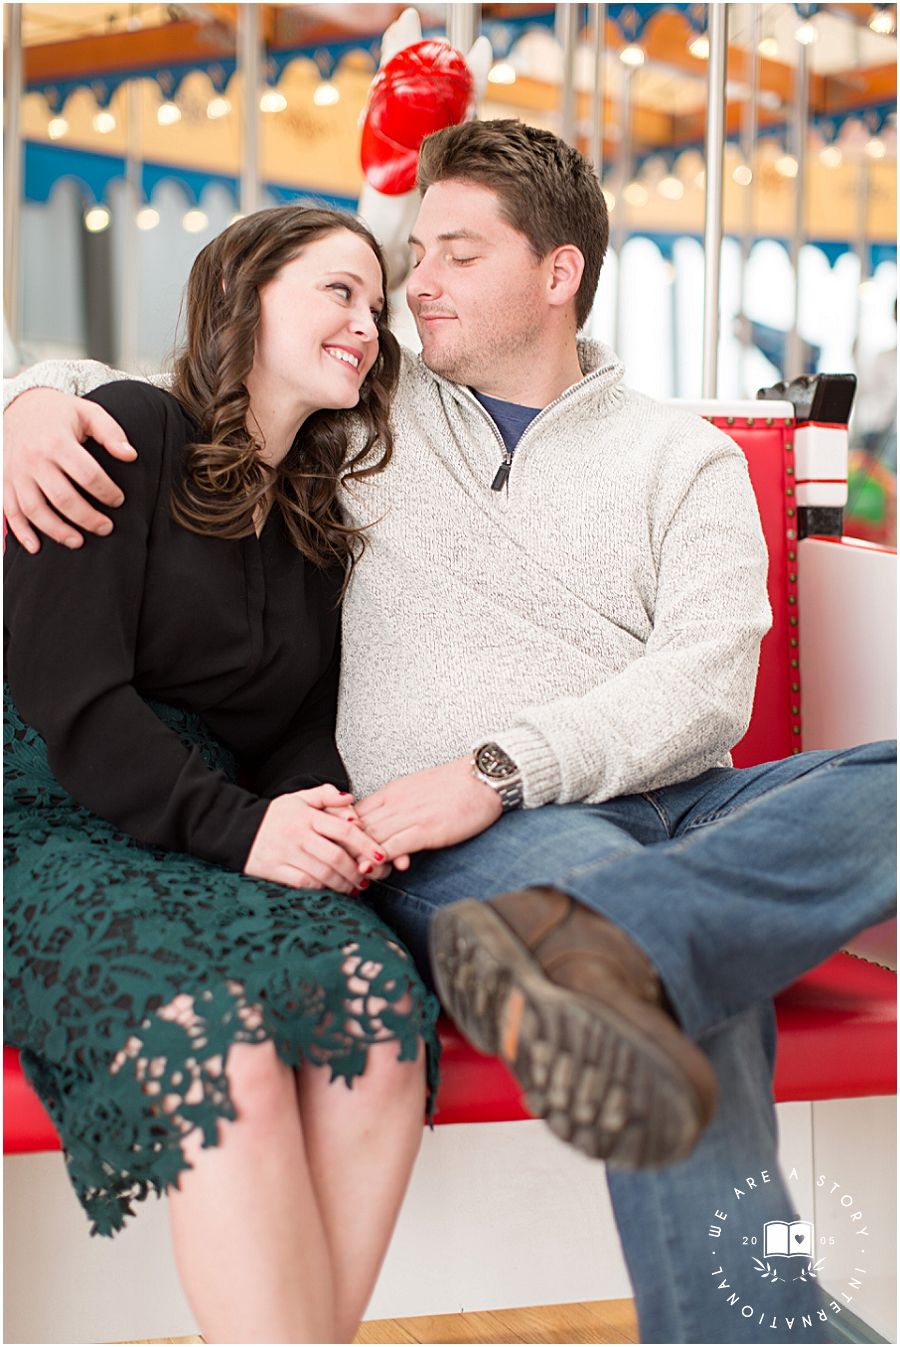 Cincinnati Wedding Photographer_We Are A Story_Molly & Matt Engagement Session_2531.jpg